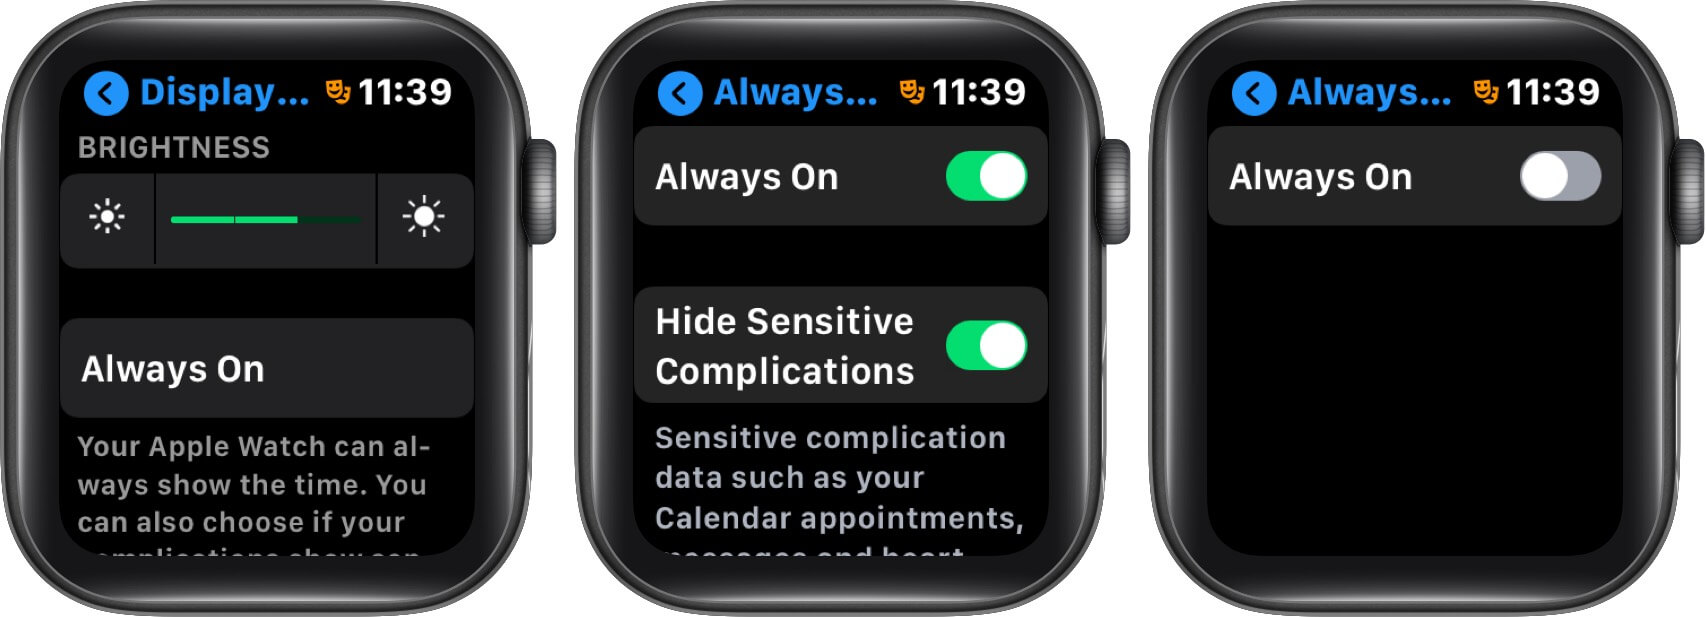 turn off always on display on apple watch